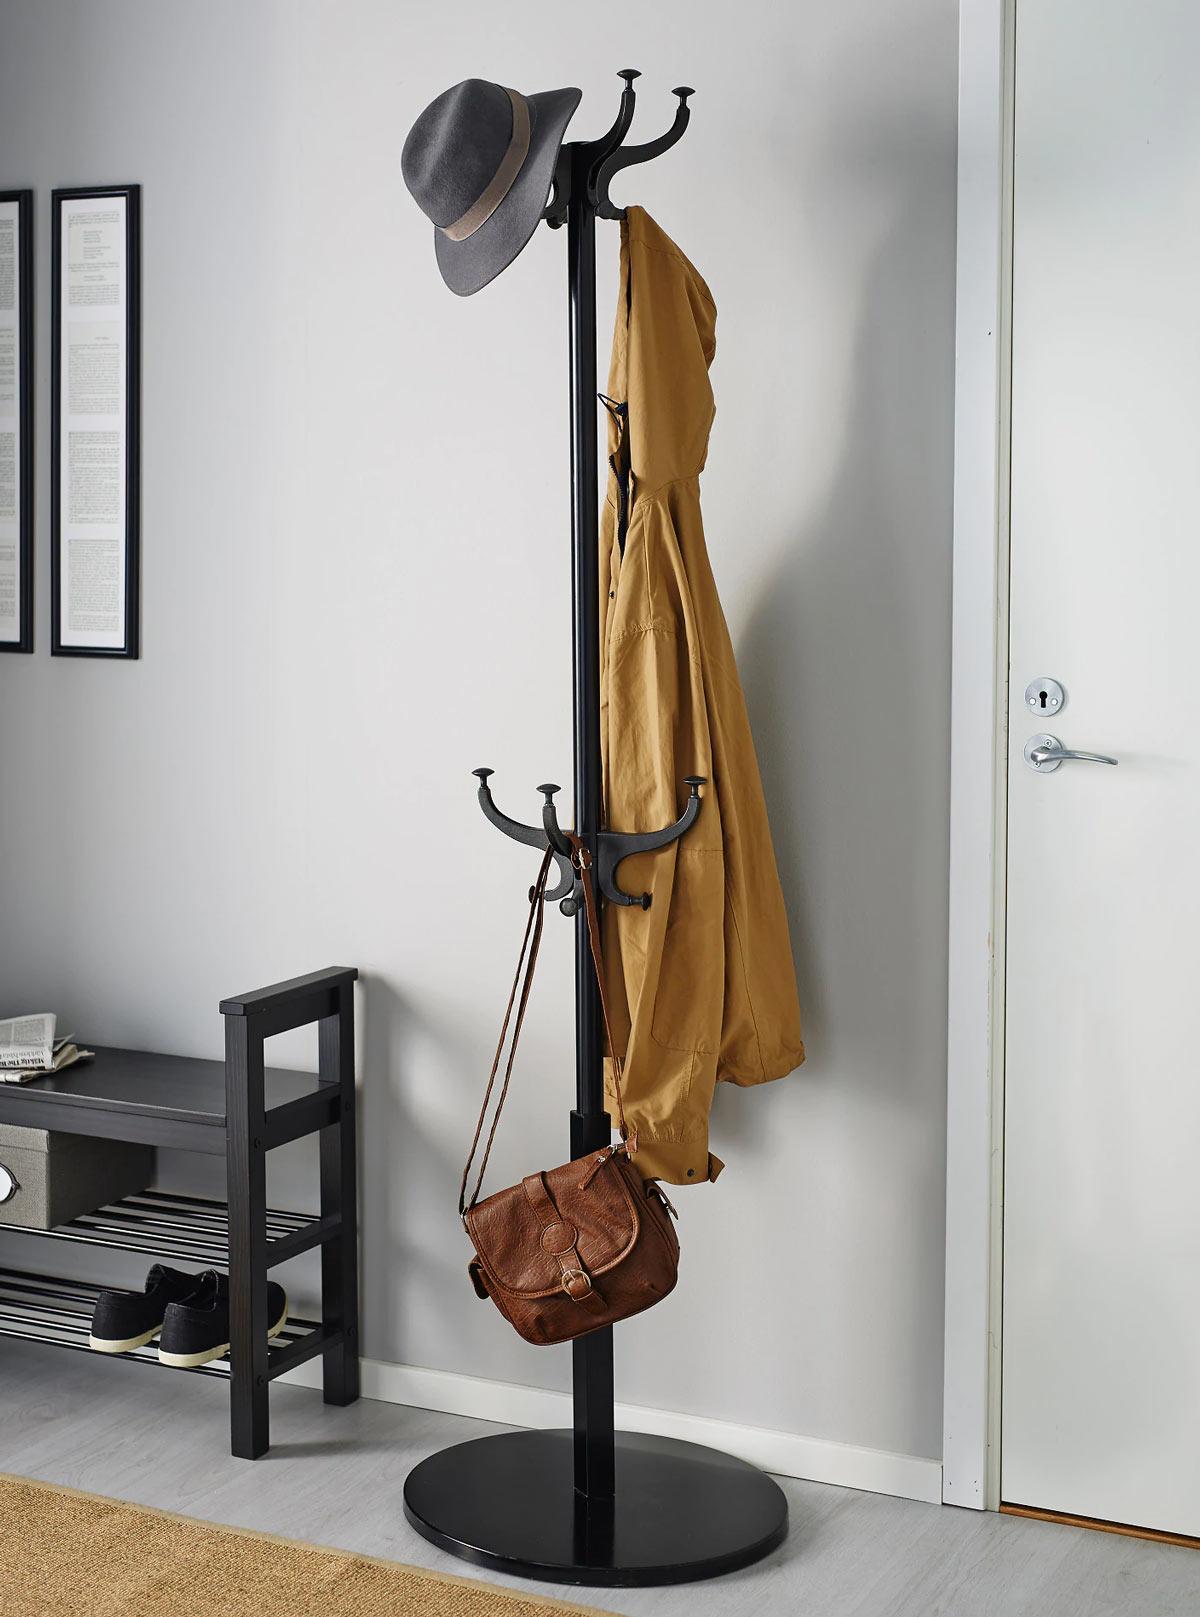 Appendiabiti IKEA per arredare l'ingresso.